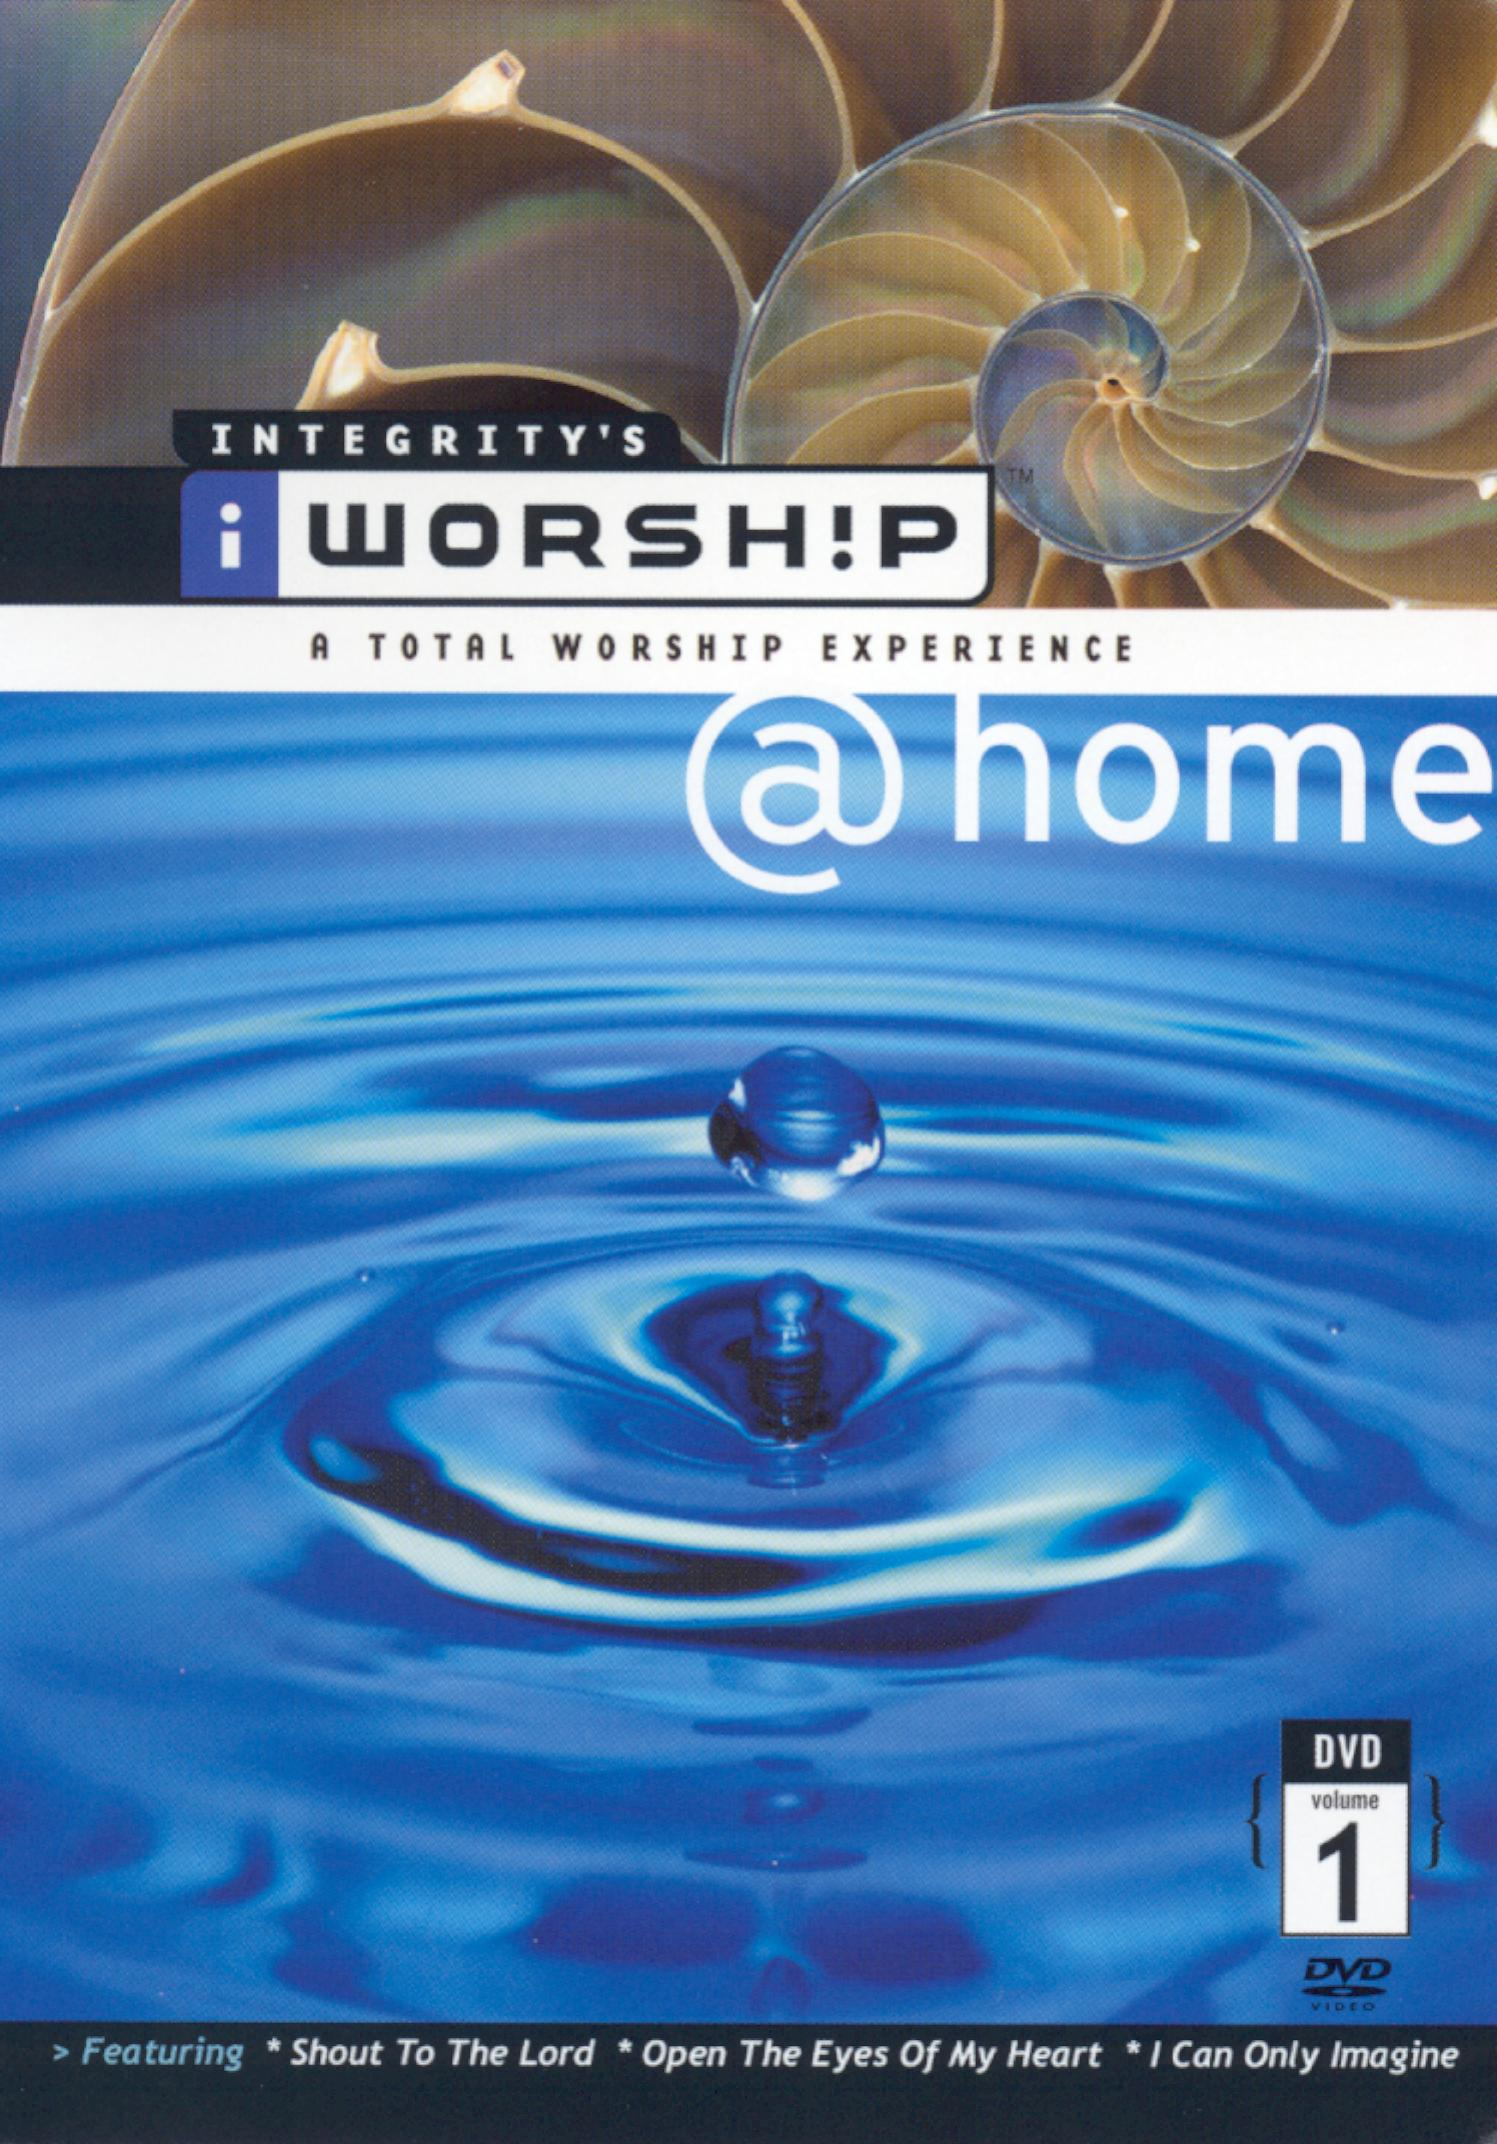 iWorship @ Home, Vol. 1